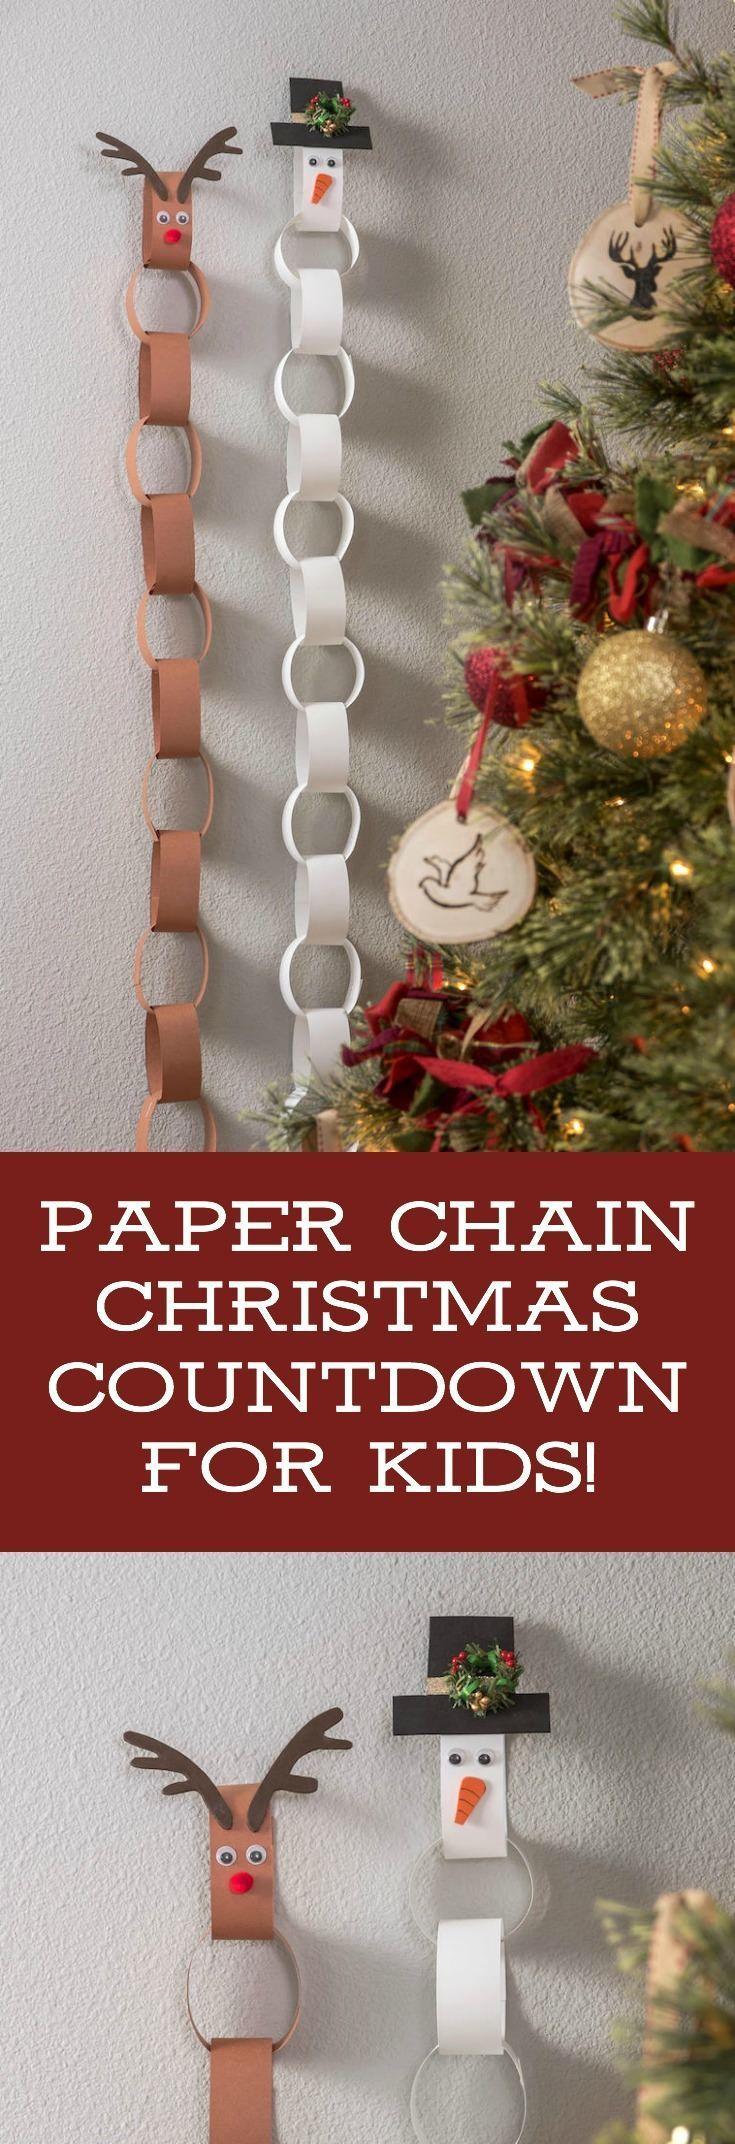 Make an EASY Paper Chain Kids Advent Calendar - Mod Podge Rocks